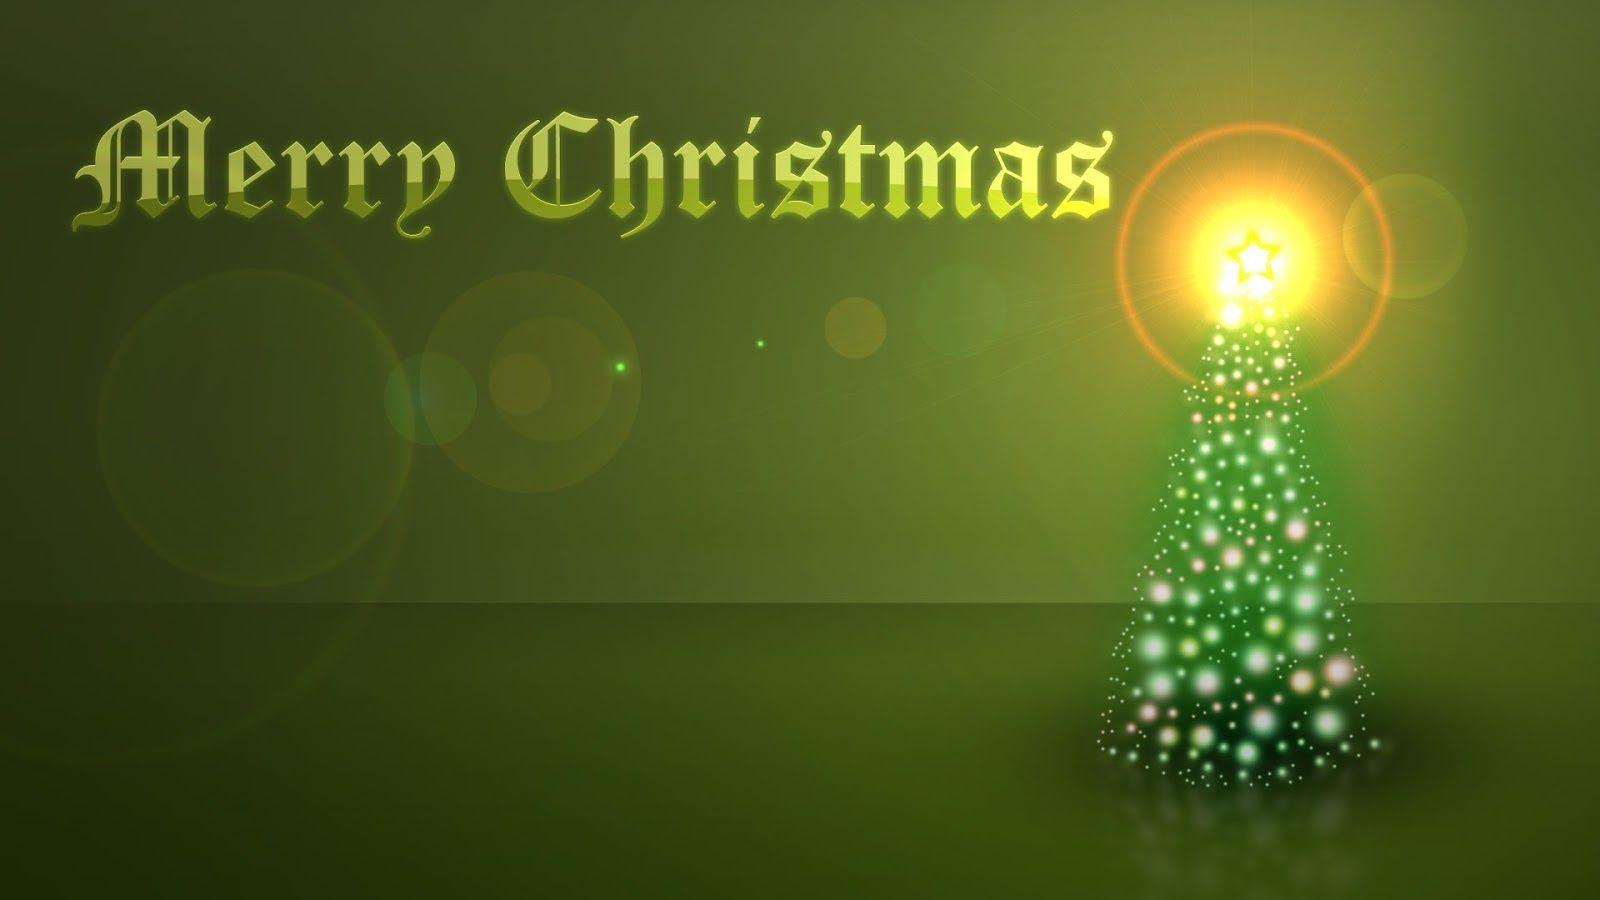 Happy Christmas Full Hd 50 Wallpapers 1920x1080 Boss